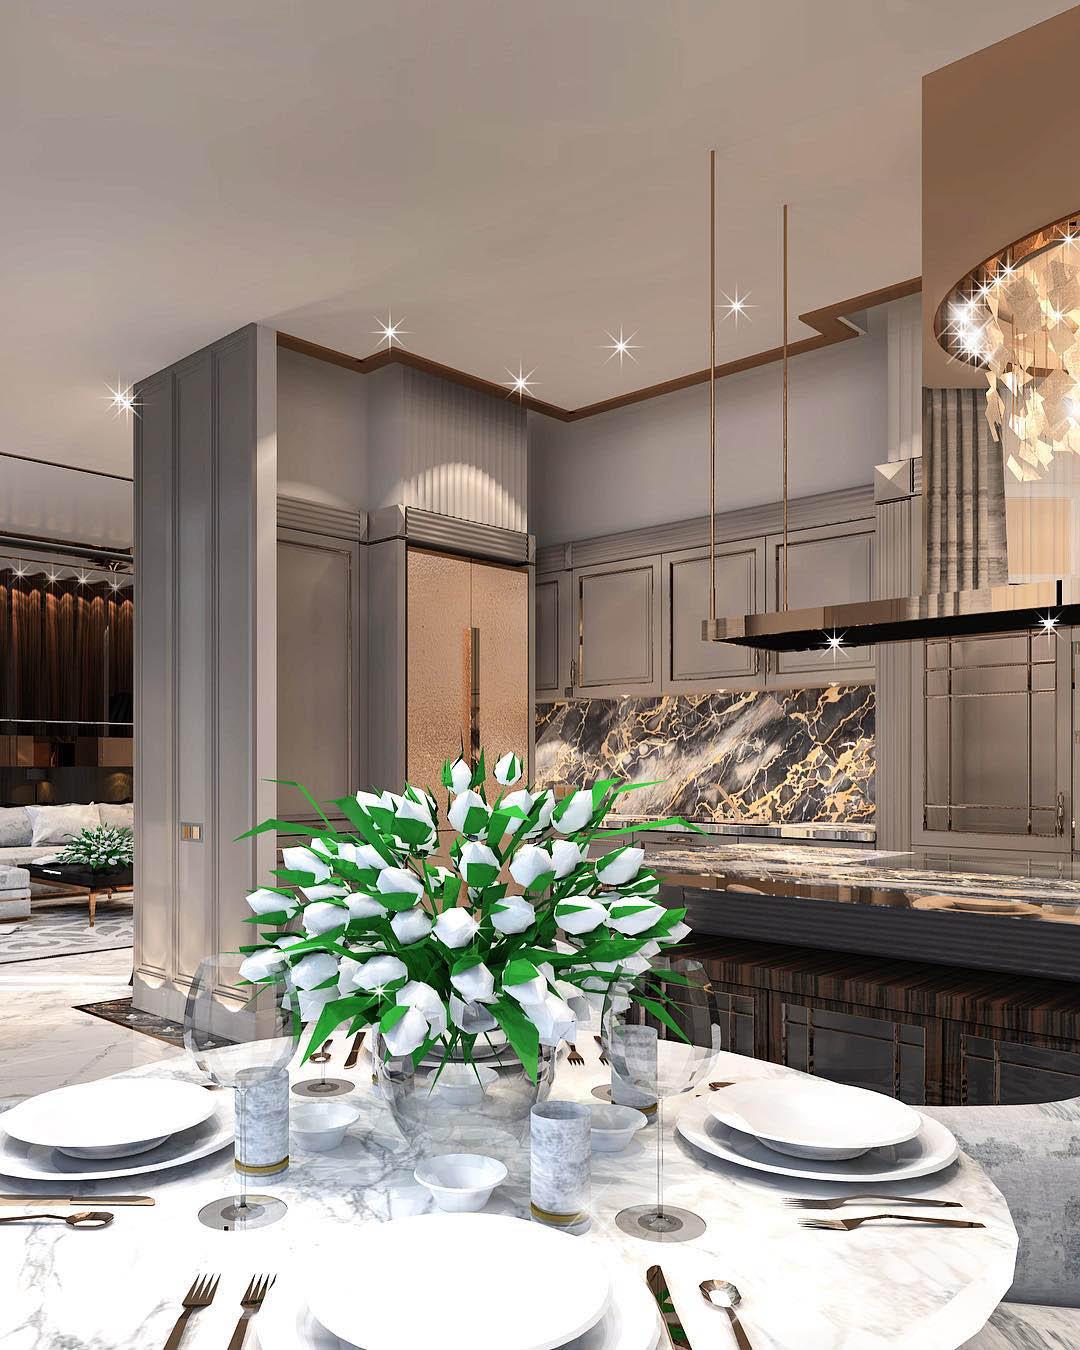 Constantin Frolov Interior Design | Luxury Kitchen Ideas